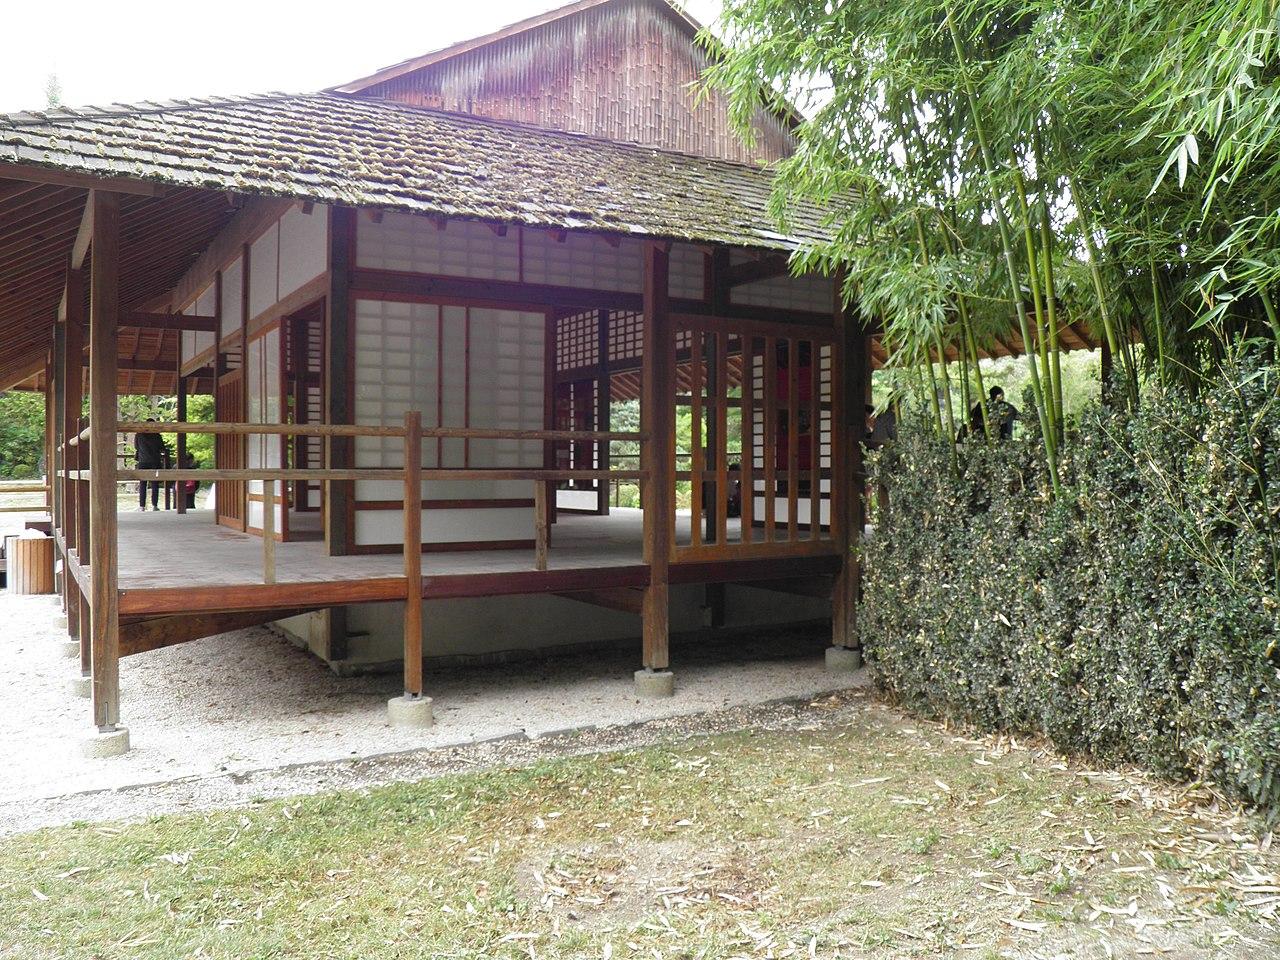 File:Jardin japonais - salon de thé (Toulouse) (2).jpg - Wikimedia ...